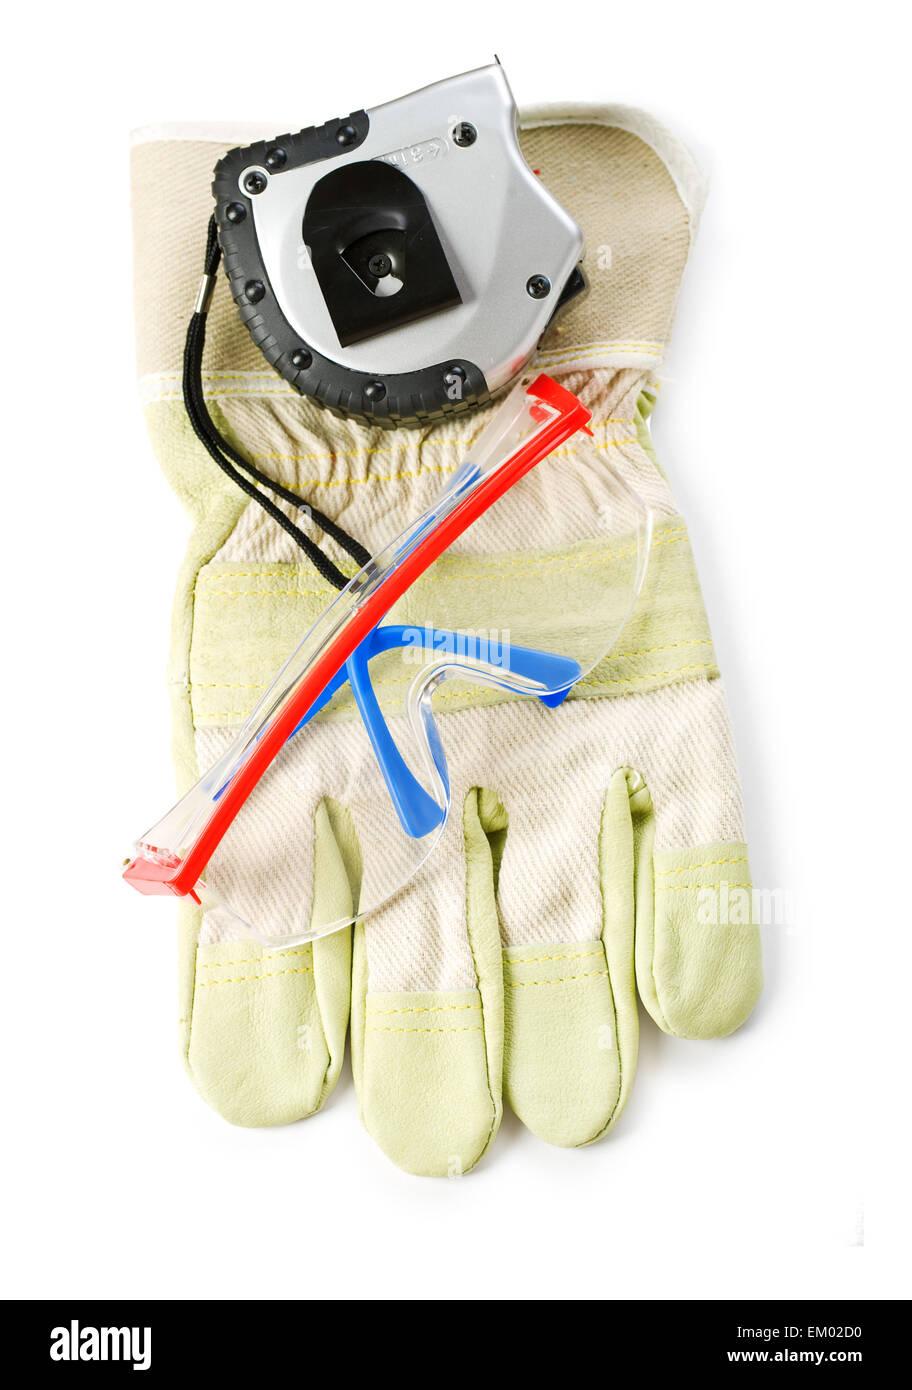 gloves safety glasses and yardstick - Stock Image